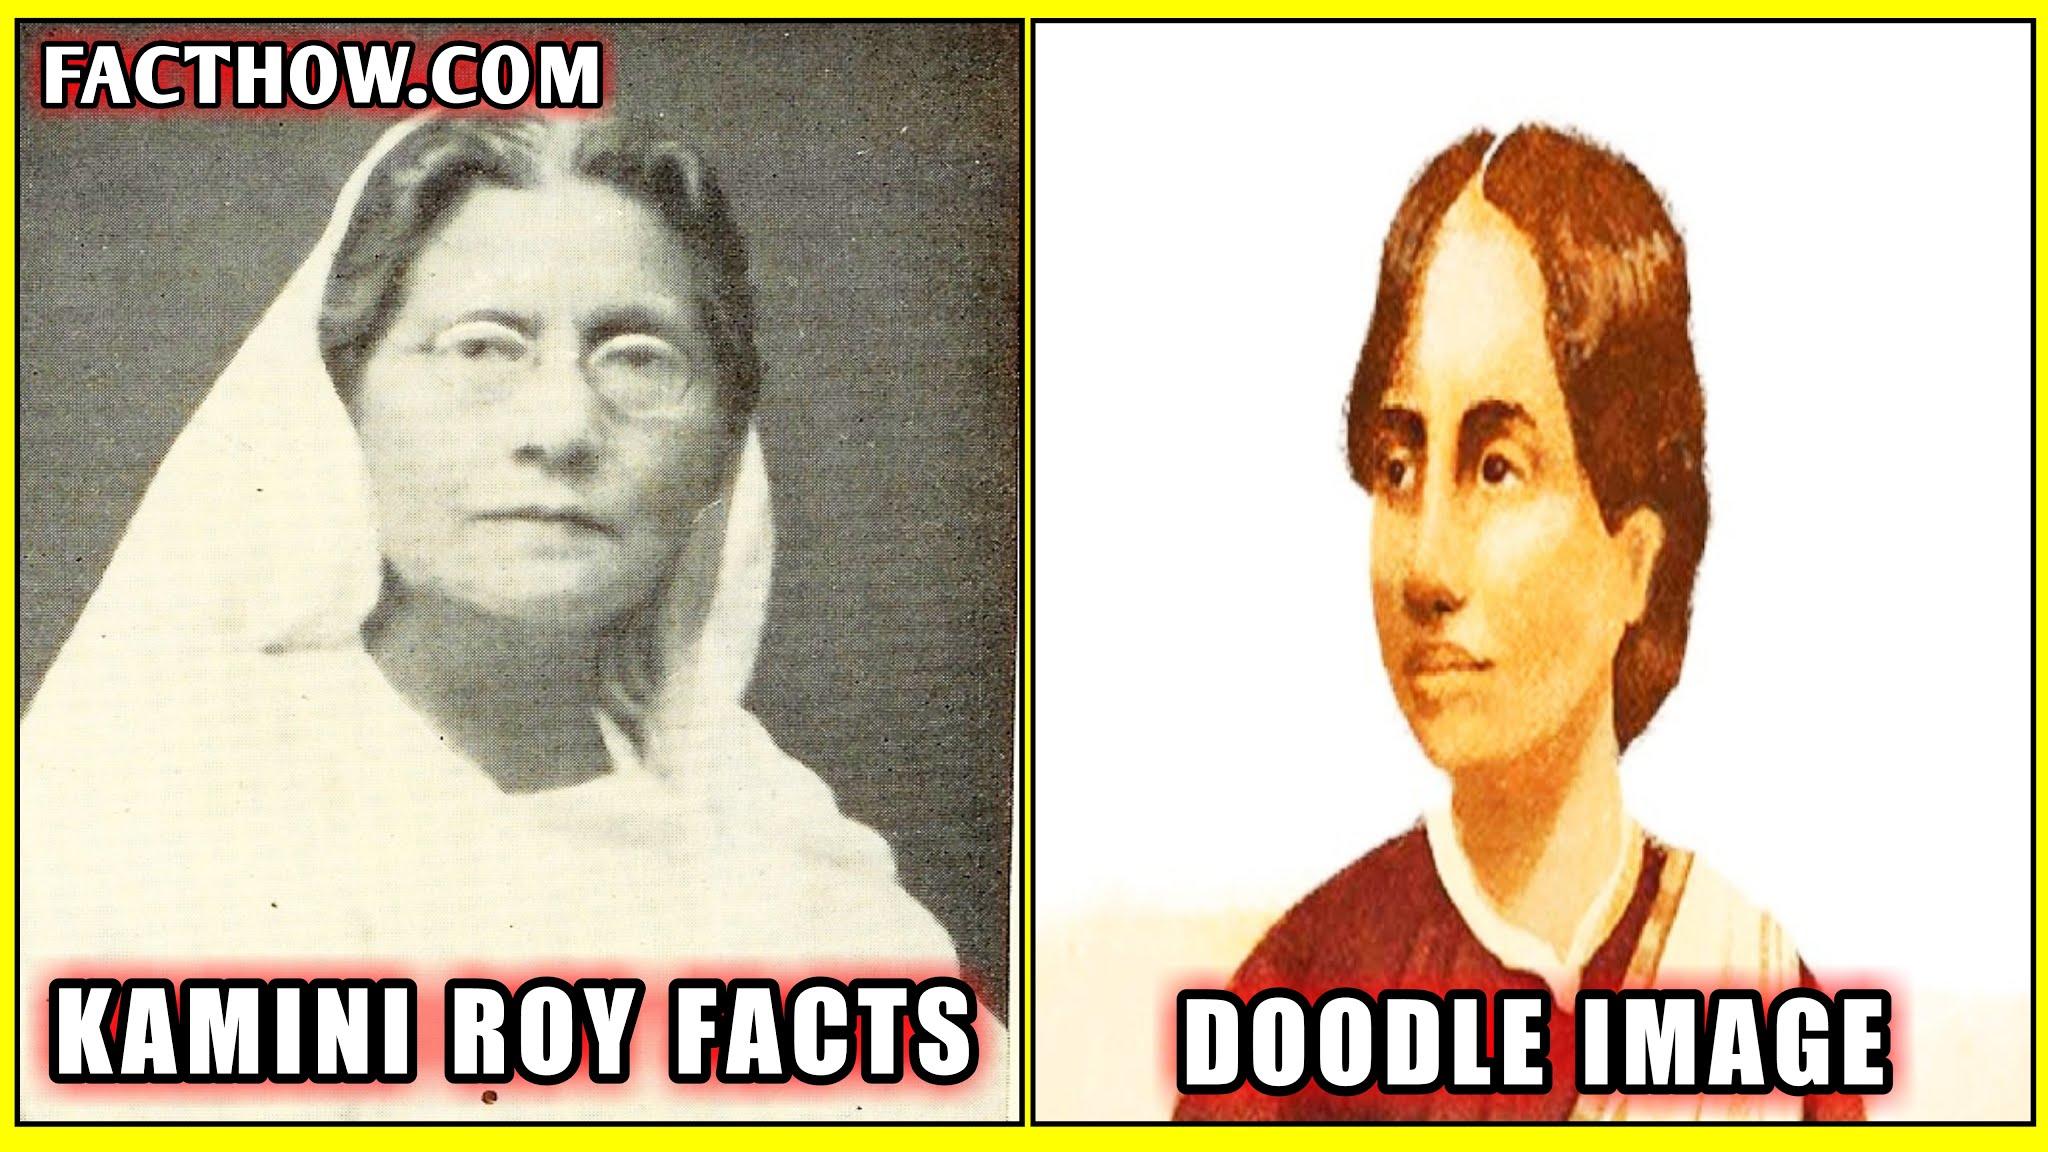 kamini-roy-biography-lifestory-facts-google-doodle-star-kamini-roy-facts-tathya-facthow-fact-how-google-trends-amarujala-amar-ujala-155-birthday-kamini-roy-women-empowerment-first-women-owners-graduate-british-poems-quotes-kamini-roy